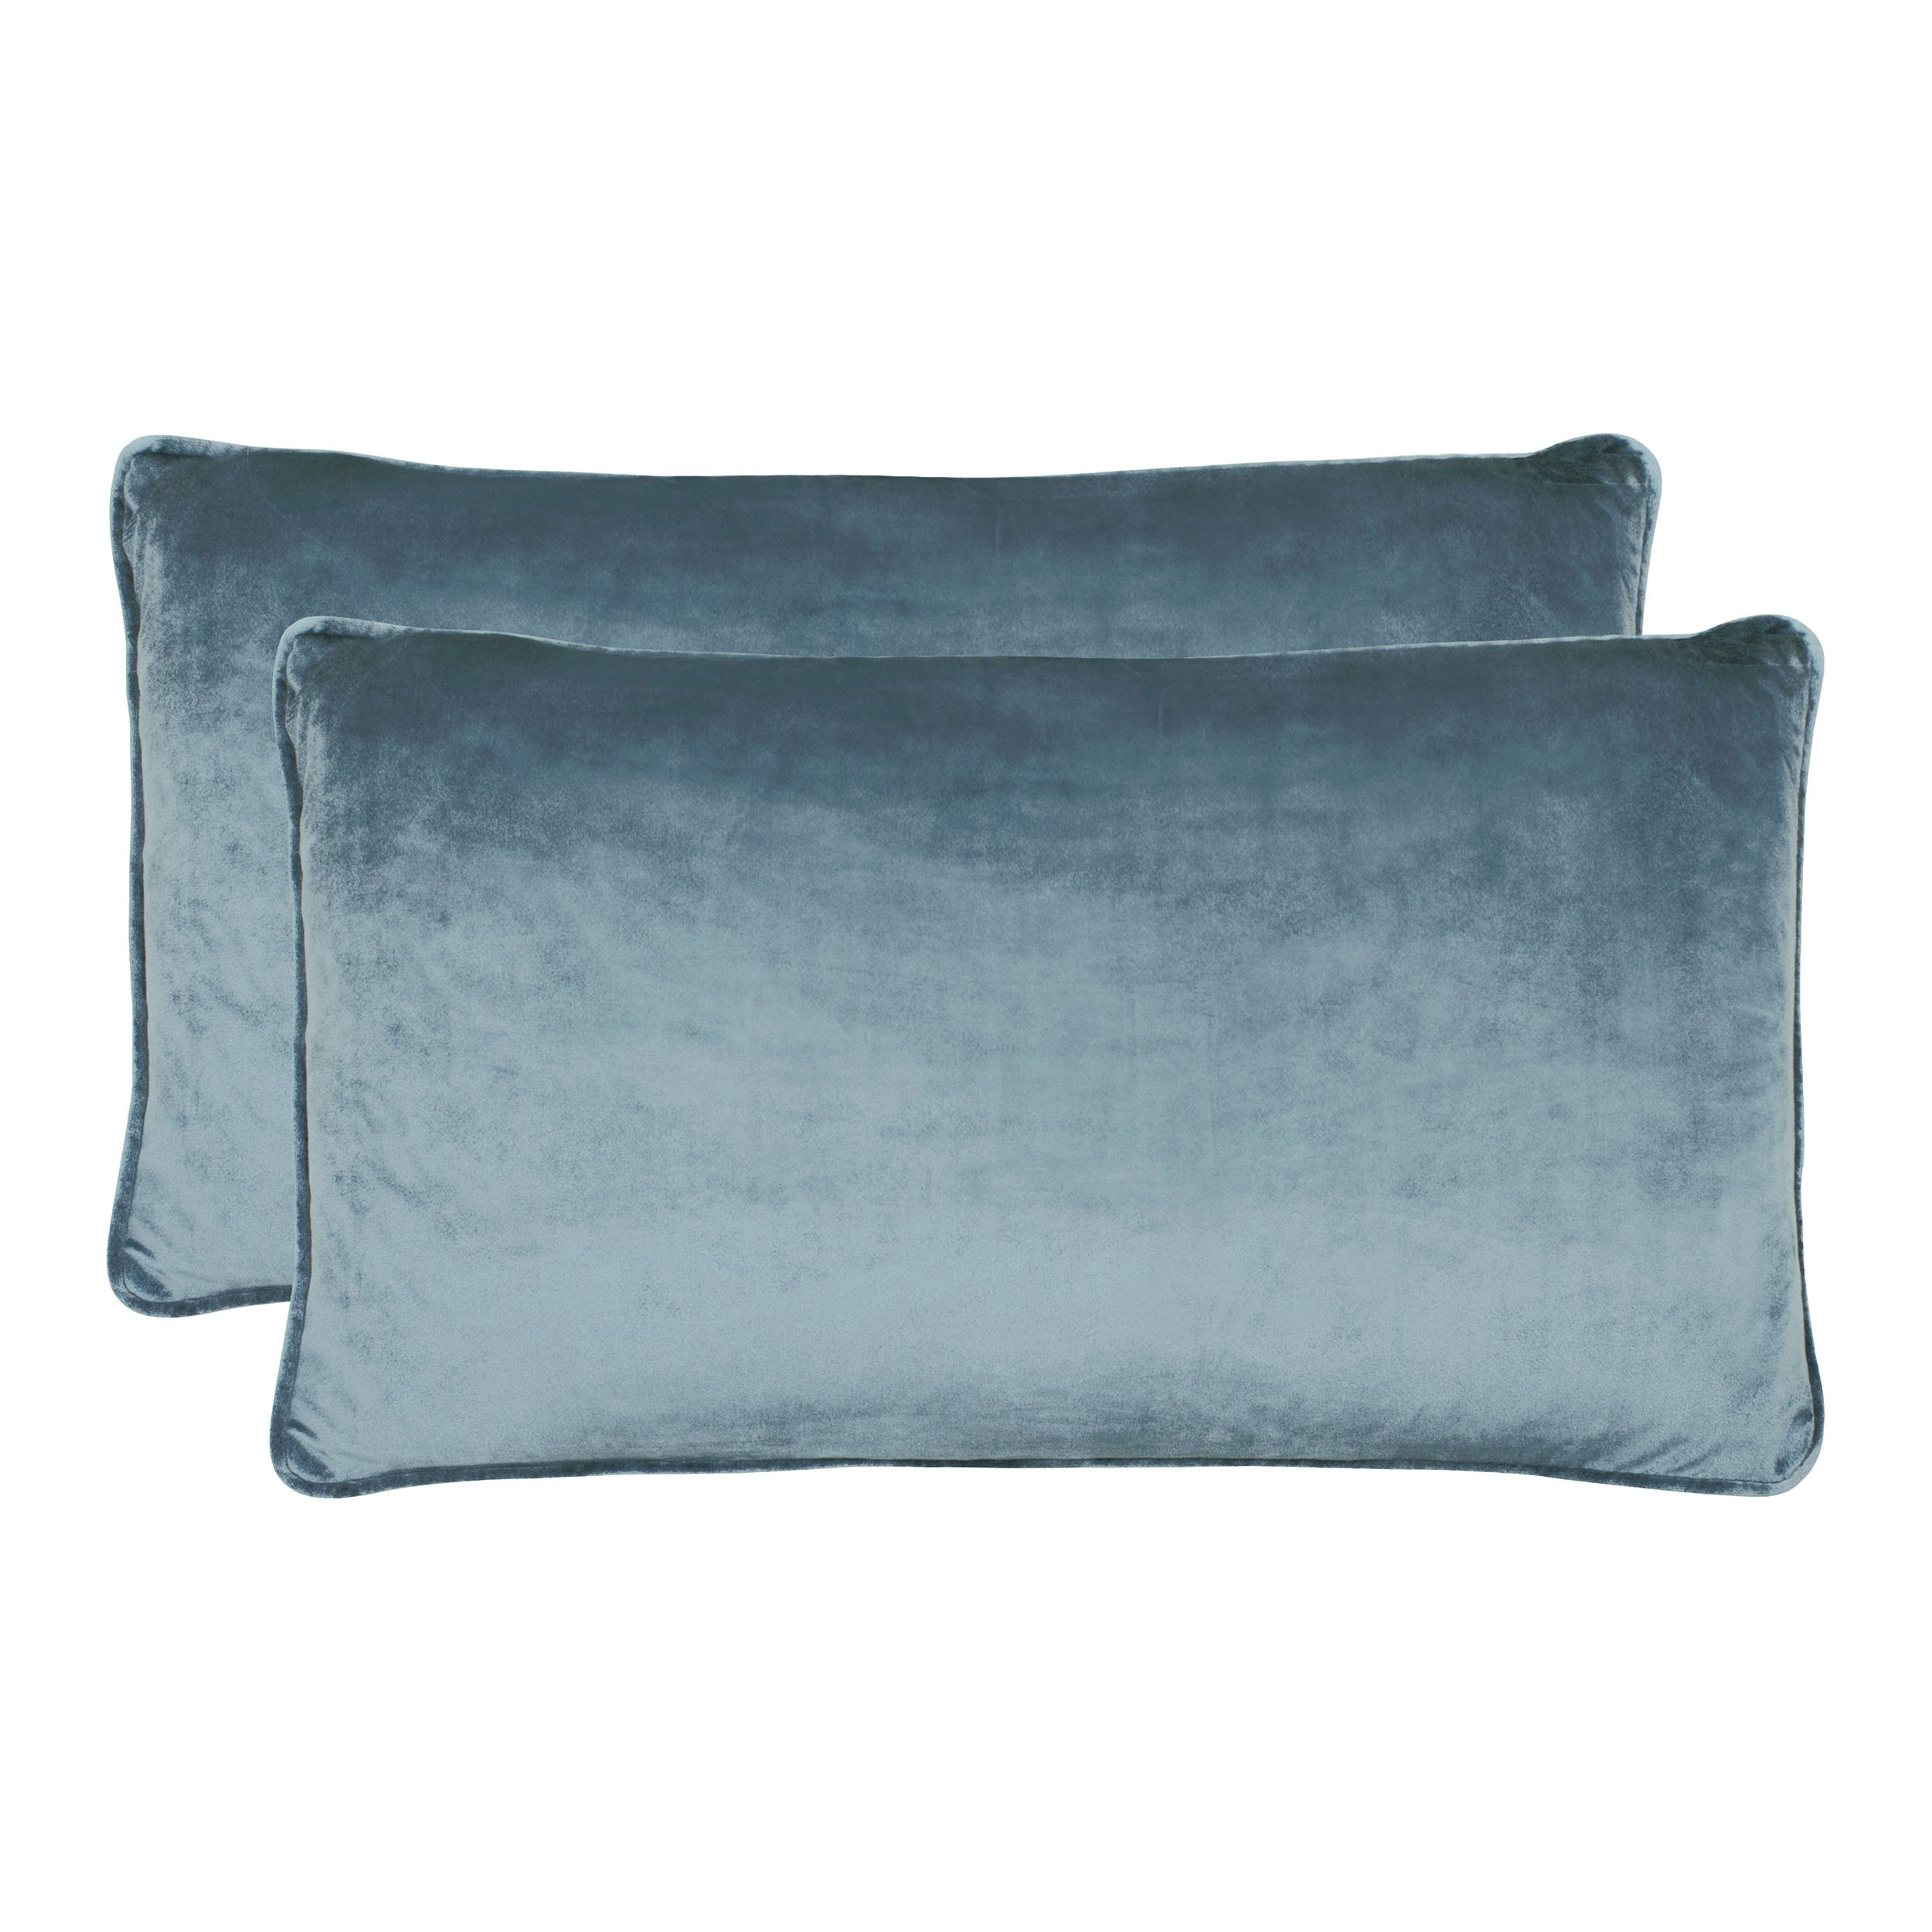 Jean Pierre New York Lucas Lumbar Velvet 2-Piece Decorative Pillow Set, 14in. x 24in, Navy by Jean Pierre New York